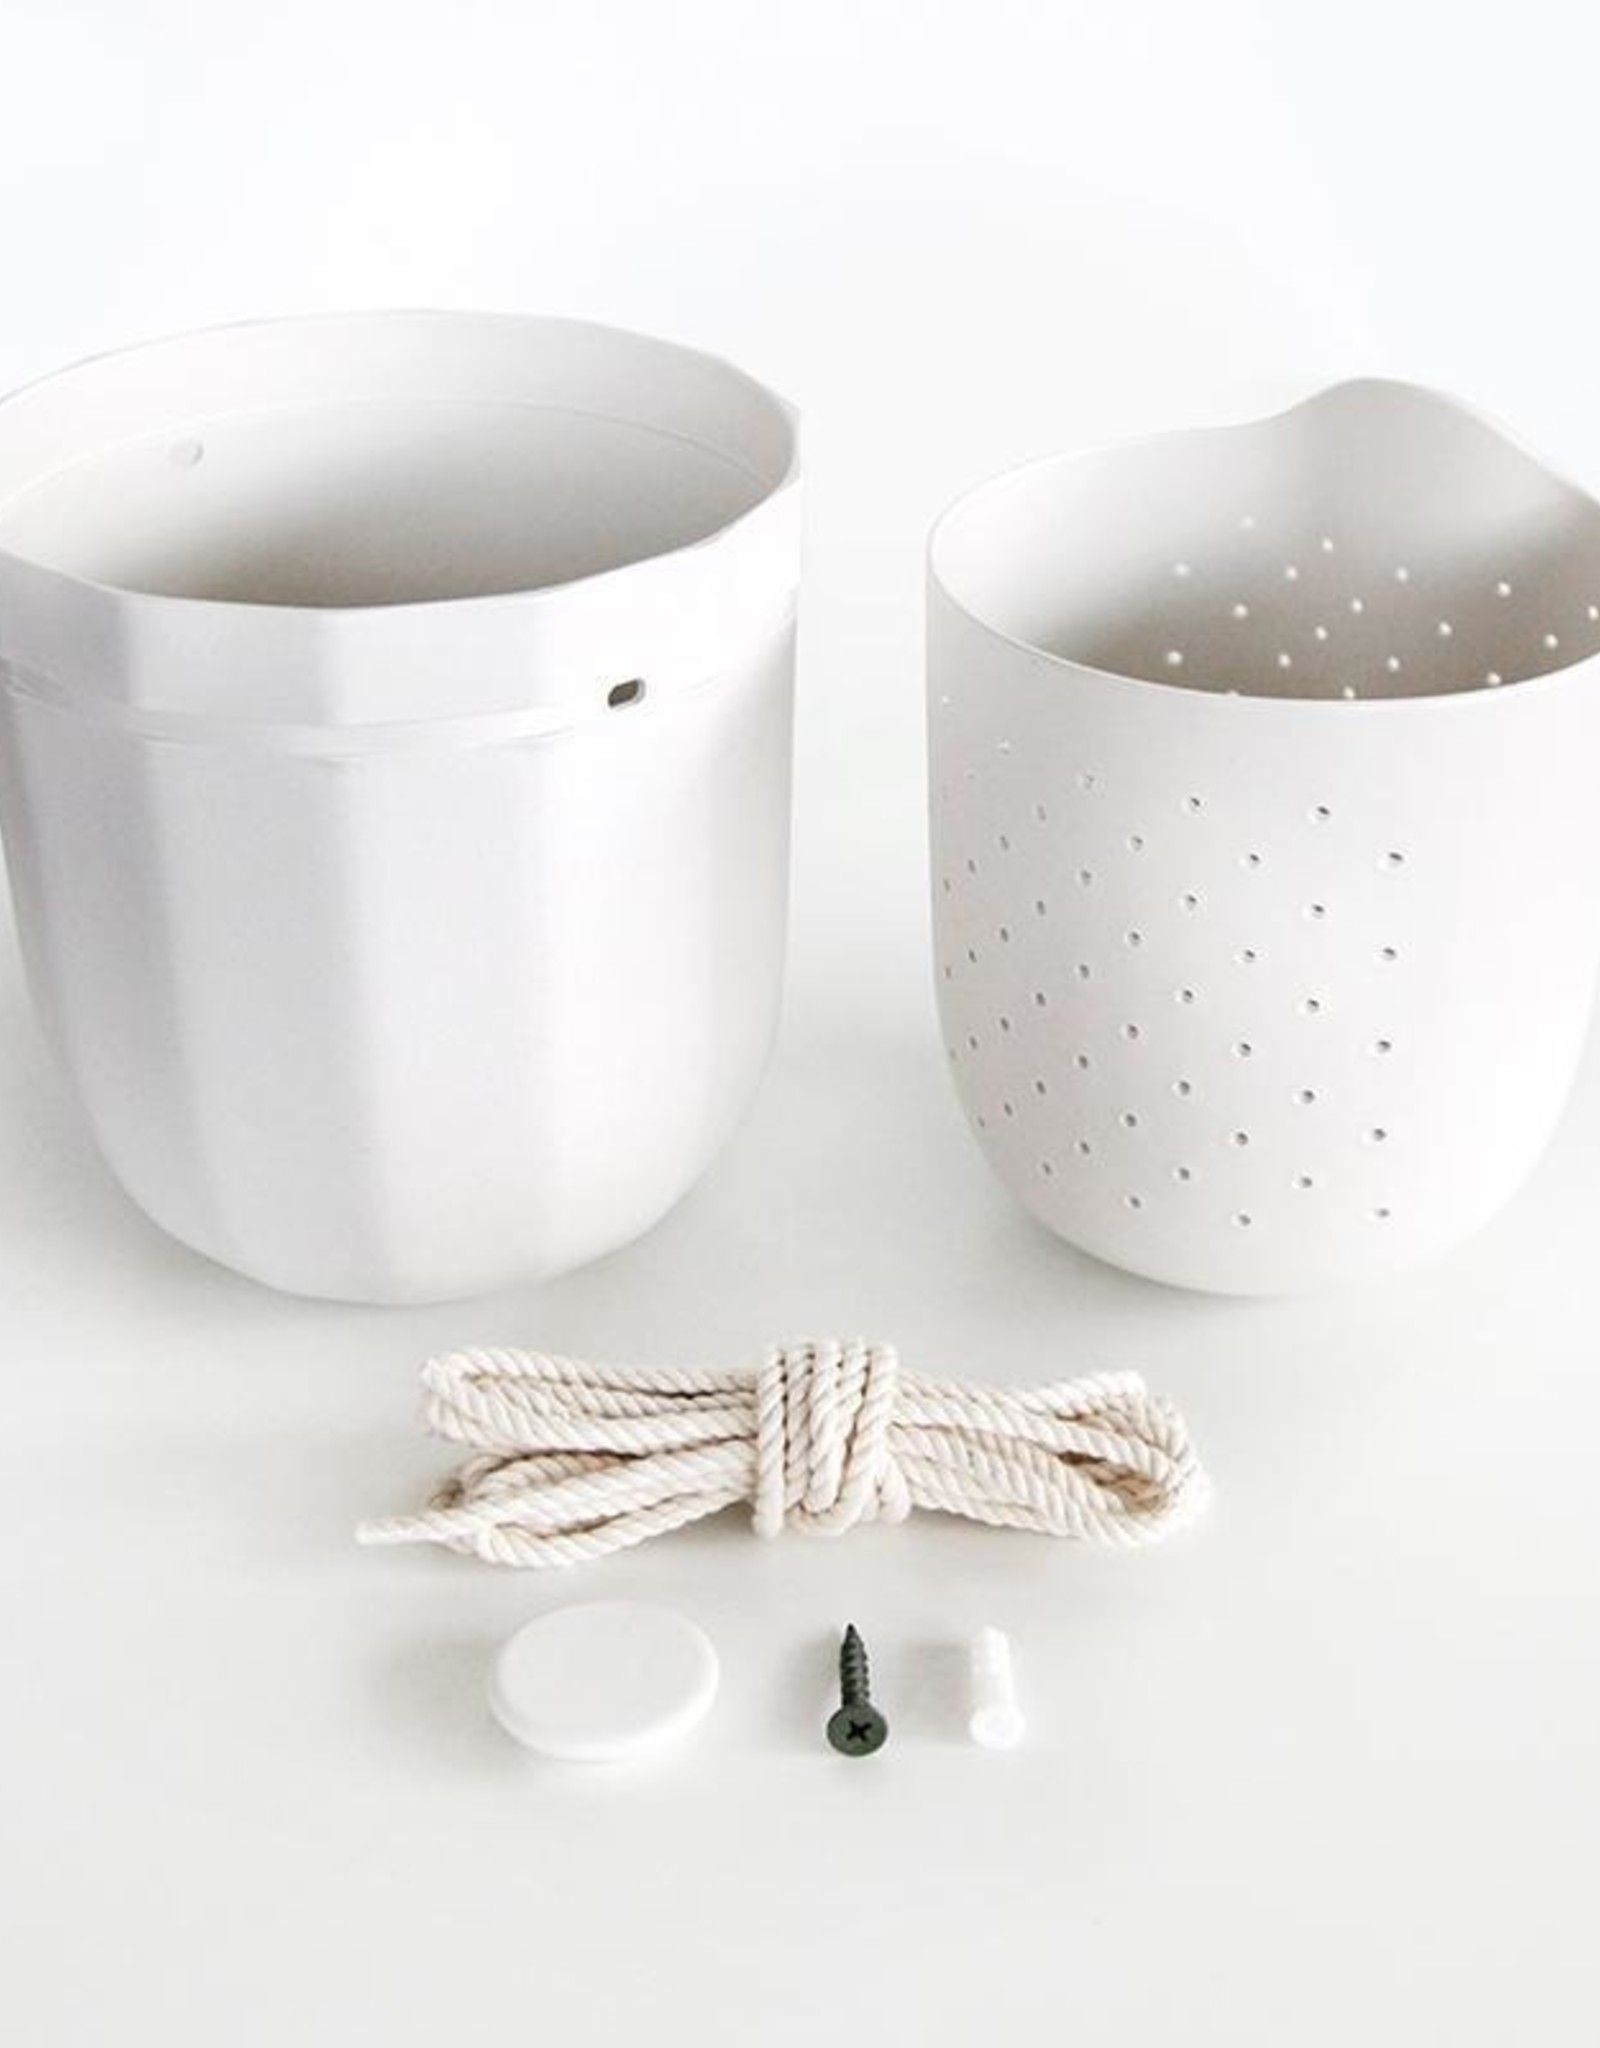 Loop Planter - White